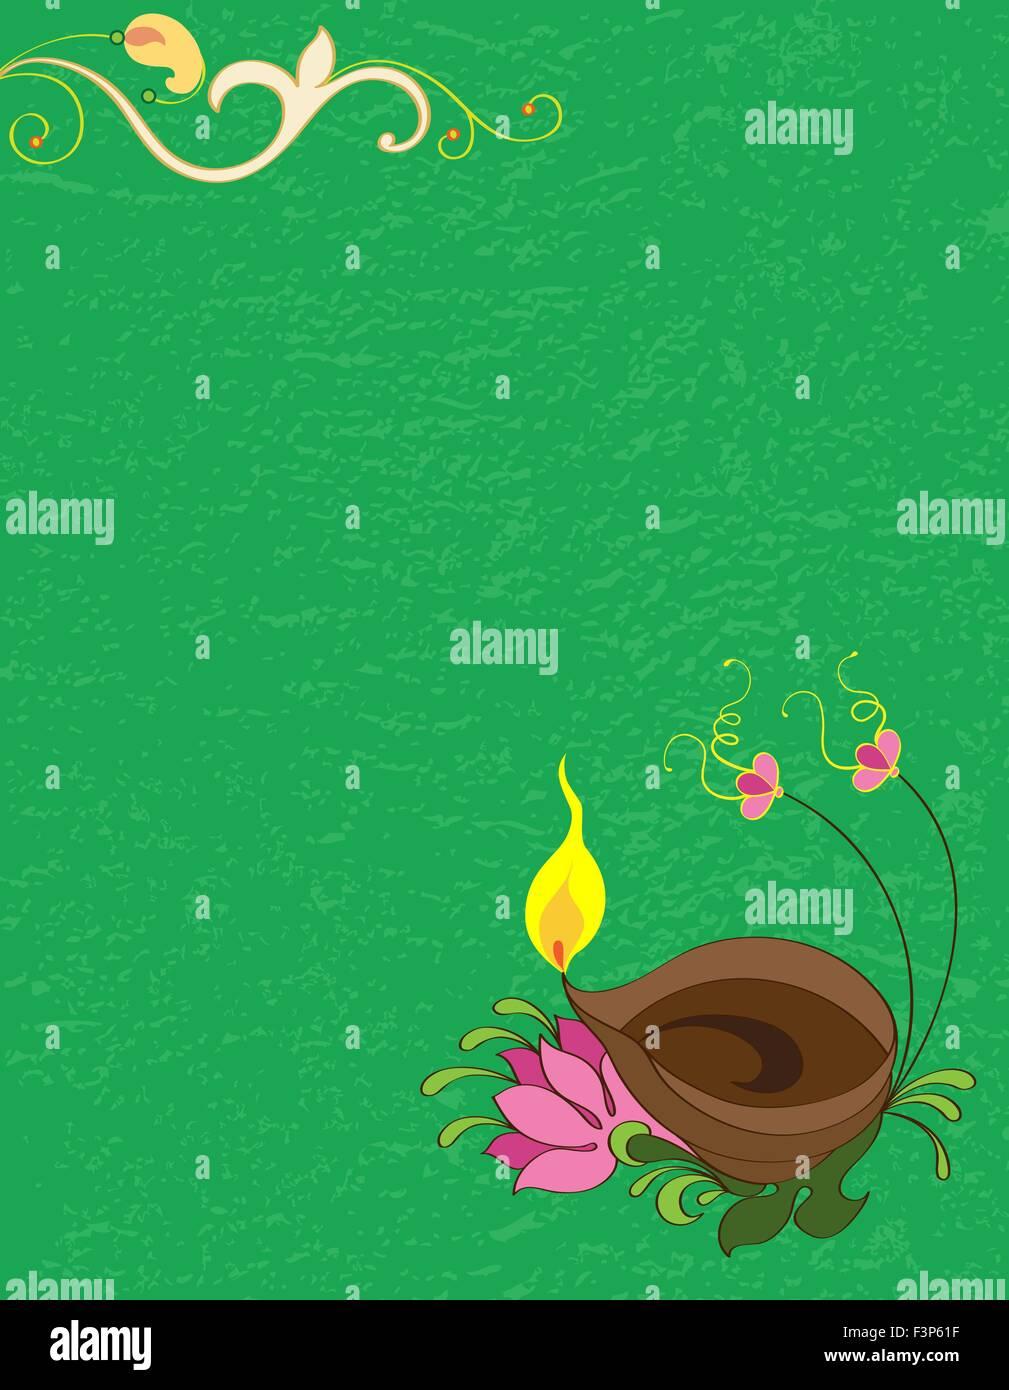 Diwali greeting design vector art stock vector art illustration diwali greeting design vector art m4hsunfo